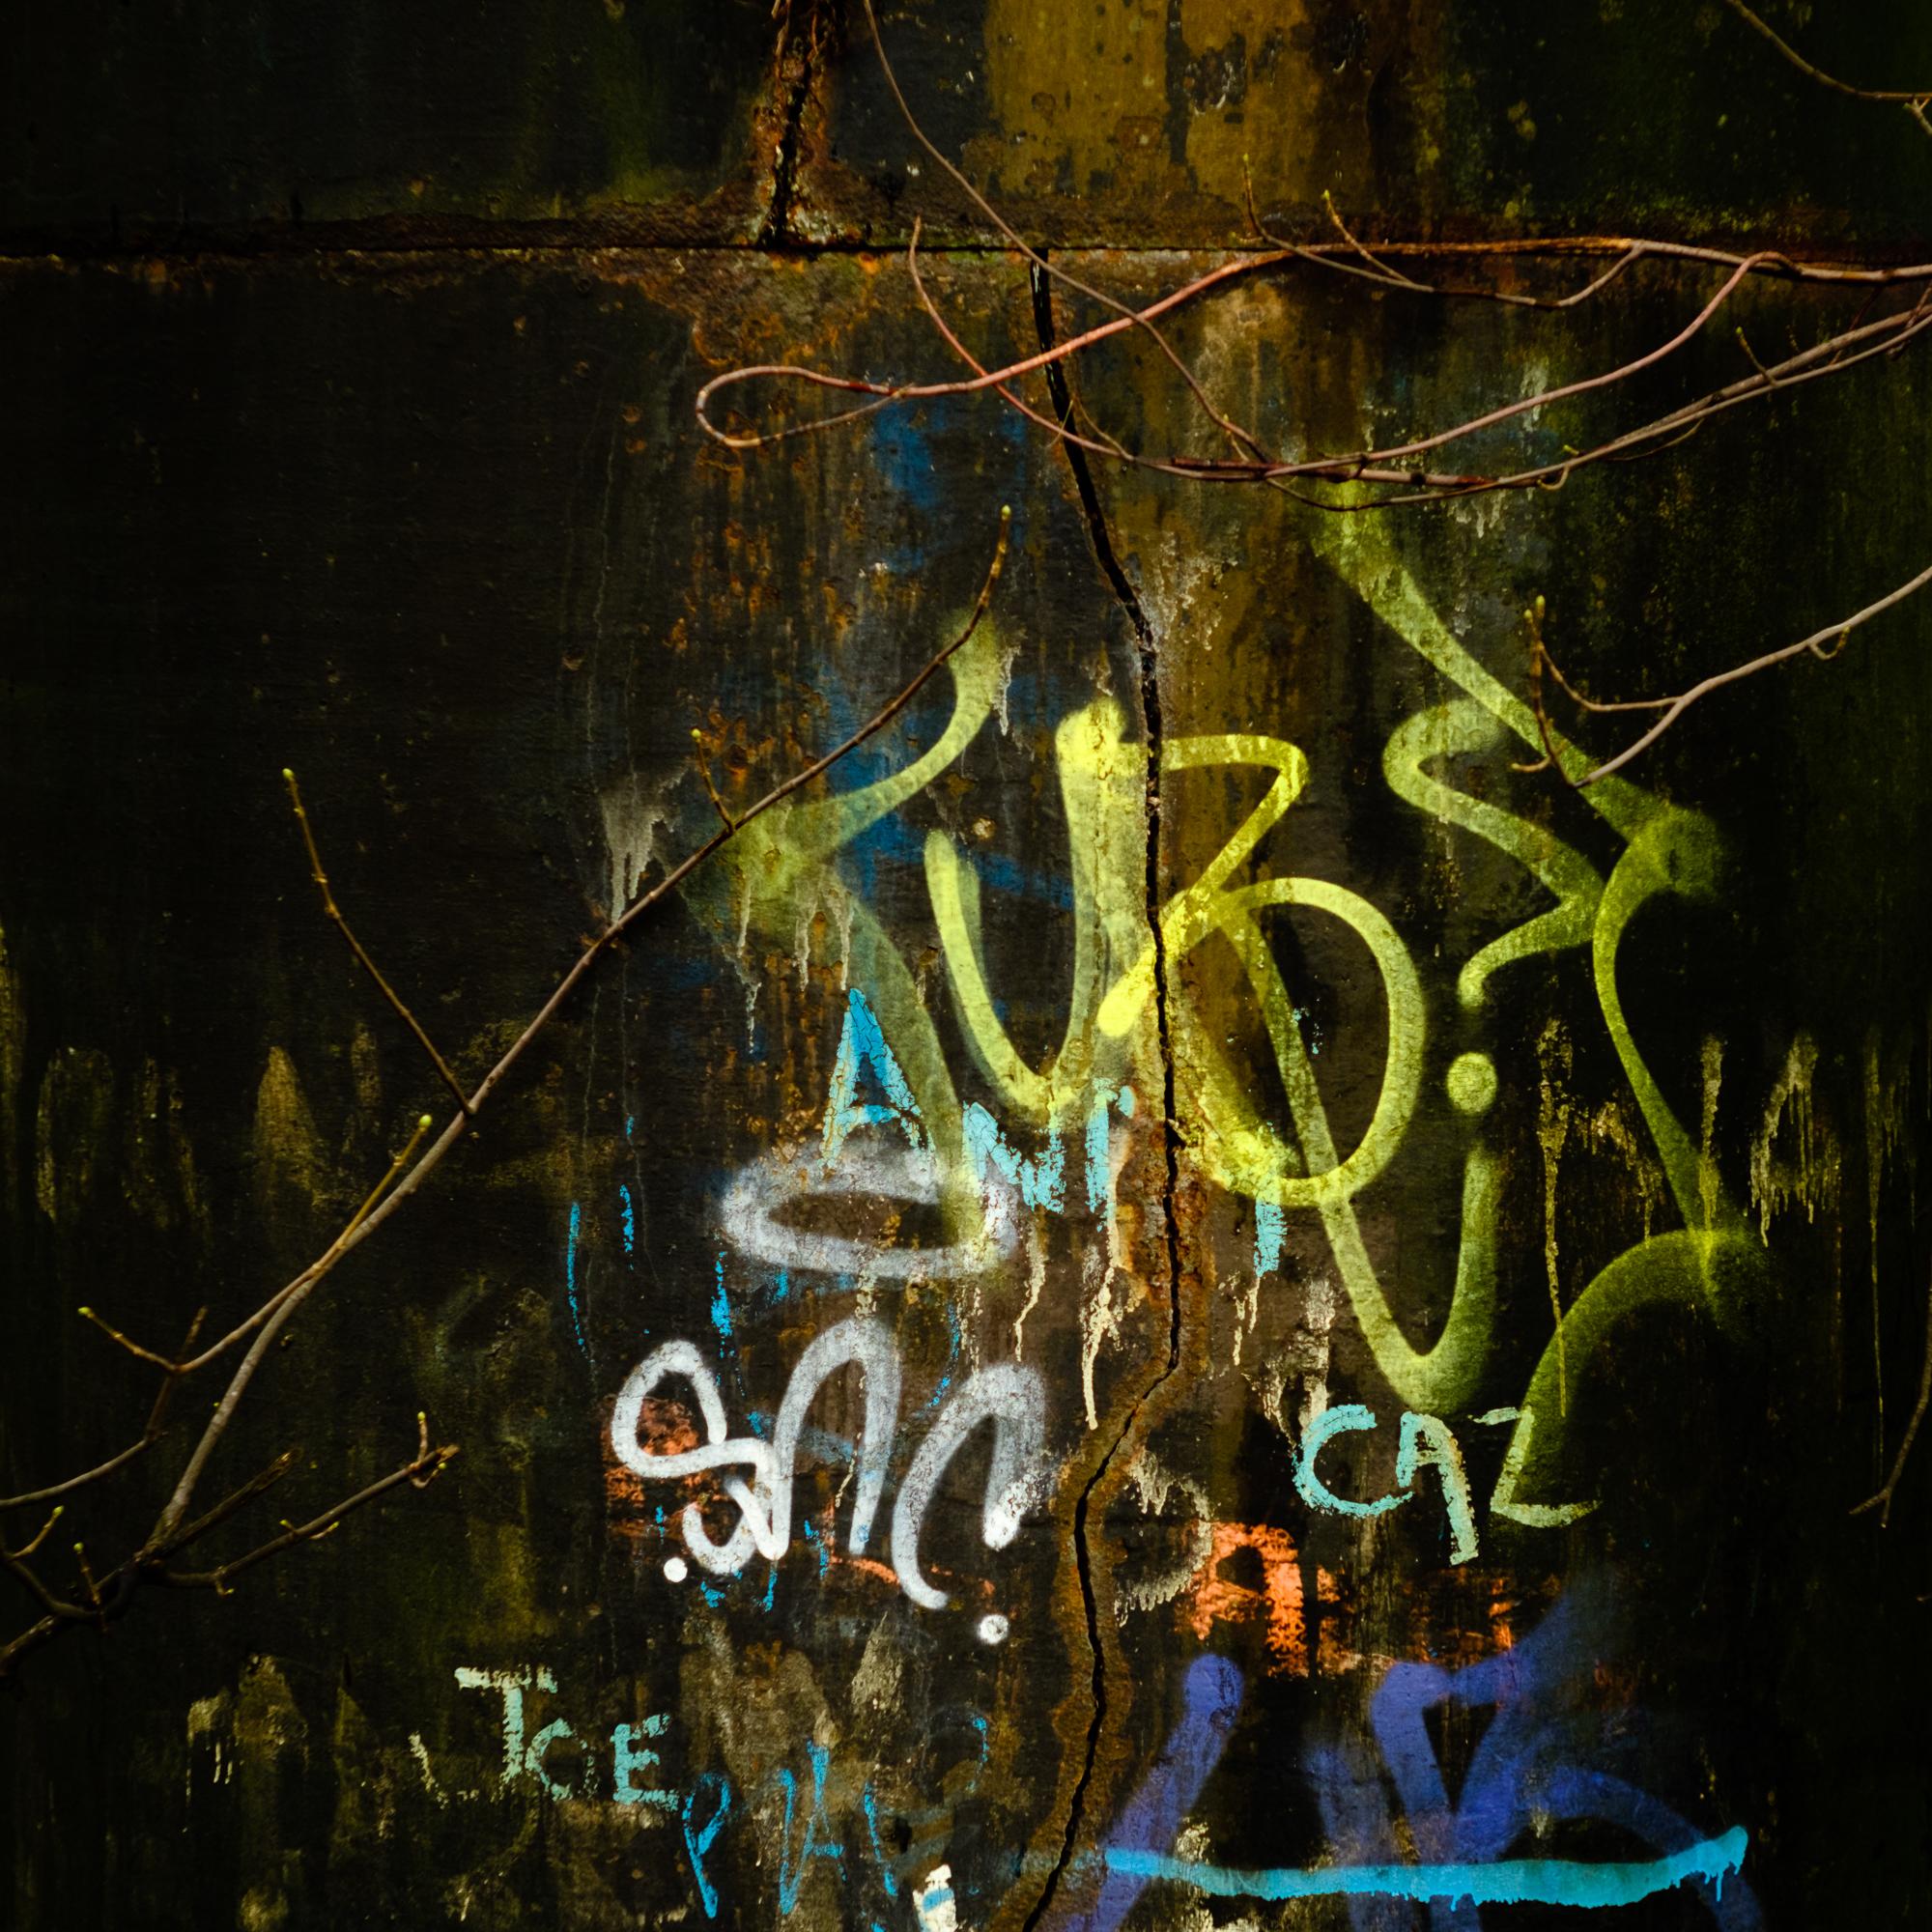 Graffiti on the old Dalmarnock railway bridge [XT2 / Velvia]